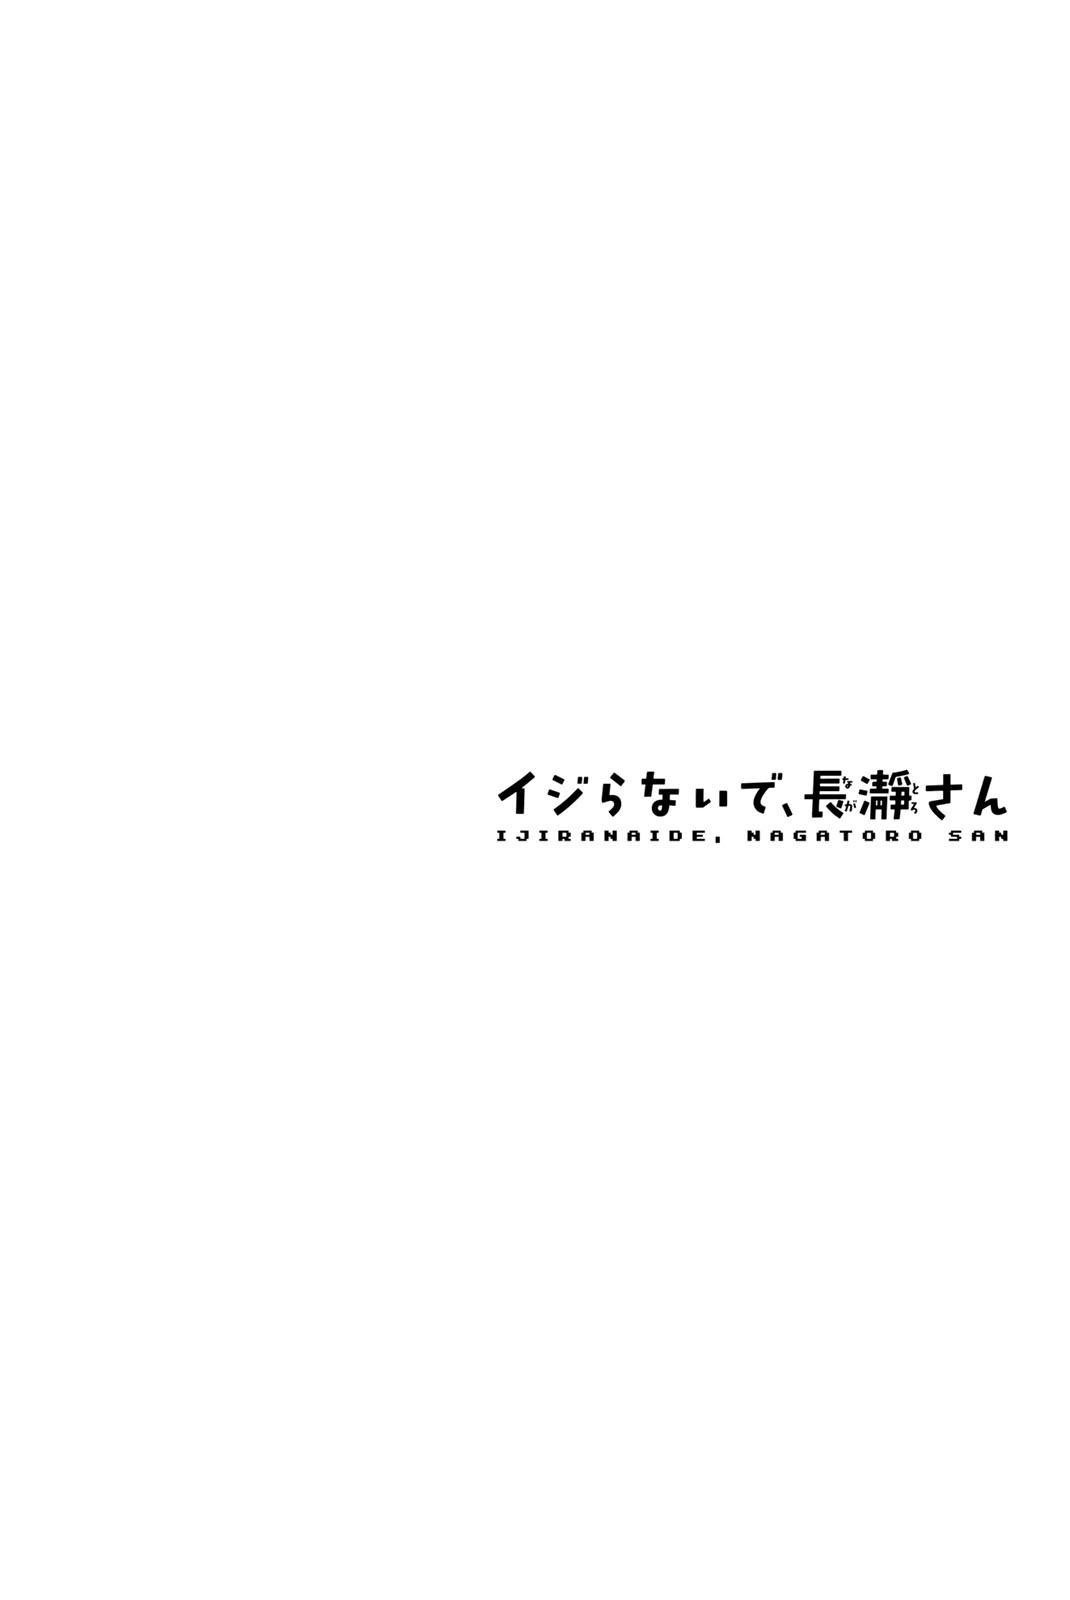 nagatoro san, nagatoro san manga, Don't Toy With Me, Miss Nagatoro, nagatoro san mal, nagatoro san age, nagatoro san characters, nagatoro san anime announcement, nagatoro san wiki, nagatoro san reddit, nagatoro san chapter 1, nagatoro san tv tropes, ijiranaide nagatoro-san trailer, ijiranaide nagatoro-san episode 1, manga similar to nagatoro san, ijiranaide nagatoro-san manga livre, ijiranaide nagatoro-san anime announcement, ijiranaide nagatoro-san artist, don't bully me nagatoro-san anime, ijiranaide nagatoro-san capitulo 1, please don't bully me nagatoro san anime, ijiranaide nagatoro-san capitulo, ijiranaide nagatoro-san português union, ijiranaide nagatoro-san important announcement, ijiranaide nagatoro-san capitulo 67, don't bully me nagatoro mangadex, nagatoro reddit, nanashi, nagatoro mal, devilchi, don't bully me nagatoro japanese name, nagatoro age, nagatoro pfp, please don t bully me nagatoro 3, nagatoro smug, nagatoro webcomic, nagatoro anime announcement, nagatoro wallpaper, nagatoro-san anime release date, nagatoro-san and senpai, nagatoro-san anime adaptation, nagatoro san author, nagatoro san anime confirmed, nagatoro san assistir, nagatoro san vai ter anime, nagatoro san bahasa indonesia, nagatoro san don't bully me, nagatoro san pt br, nagatoro san manga br, nagatoro-san characters, nagatoro san chapters, nagatoro san chapter 64, nagatoro san chapter 70, nagatoro san chapter 58, nagatoro san chapter 76, nagatoro san chapter 73, nagatoro san chapter 63, nagatoro san chapter 72, nagatoro san ending, nagatoro san episode 1, ijiranaide nagatoro-san episode, nagatoro san manga español, nagatoro san manga español cap 1, ijiranaide nagatoro san español pdf, nagatoro san figure, nagatoro san fandom, nagatoro san fanfiction, nagatoro san final, nagatoro san genre, nagatoro san goyabu